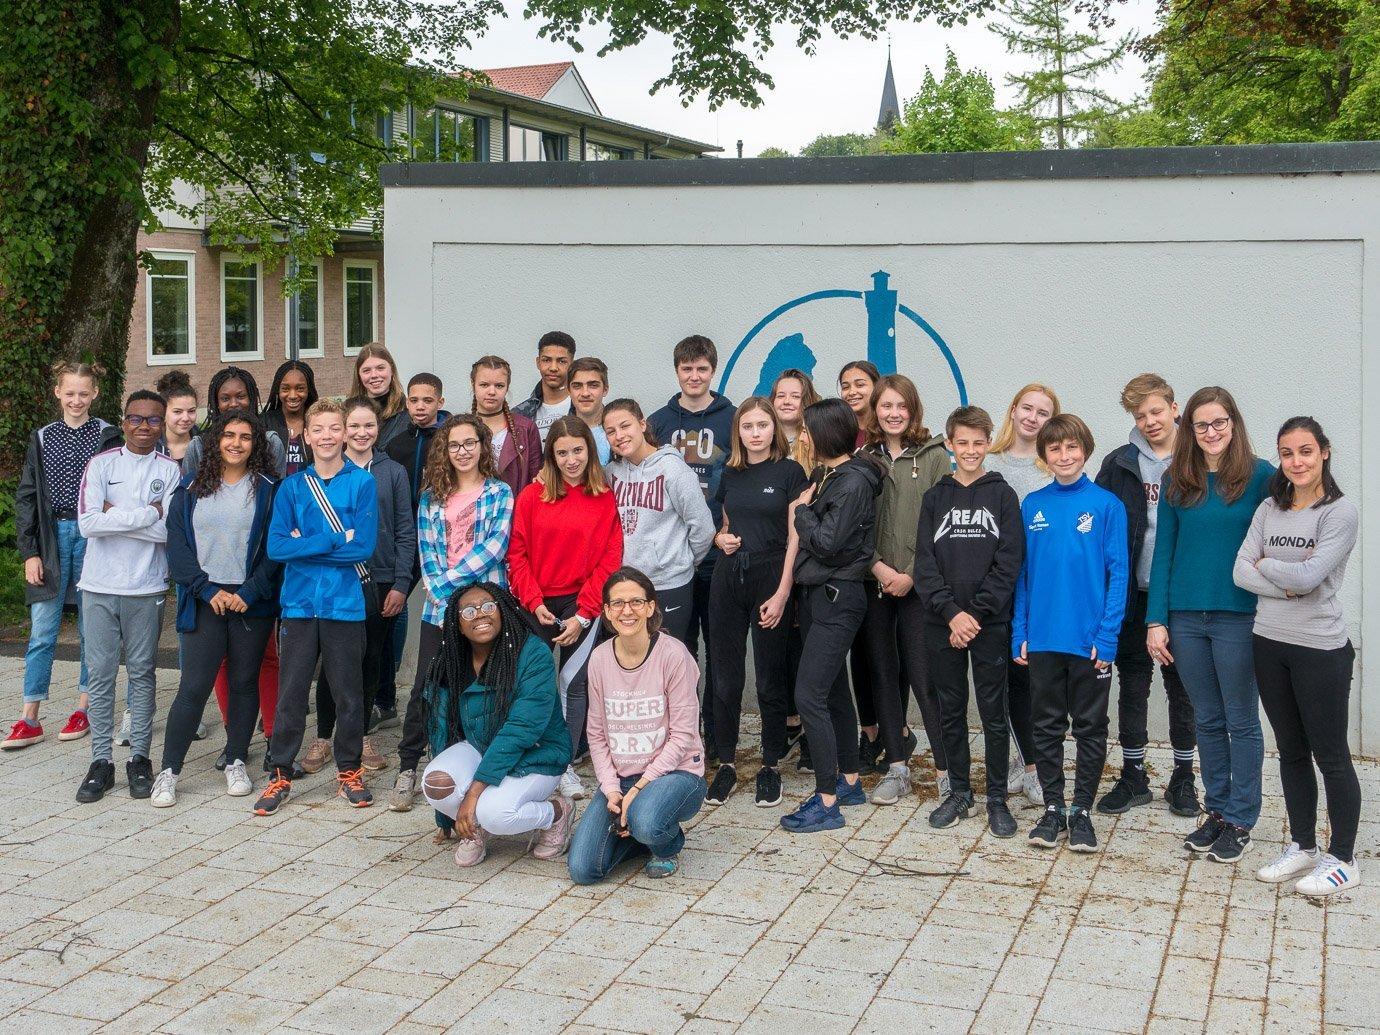 Chelles zu Gast in Lindau